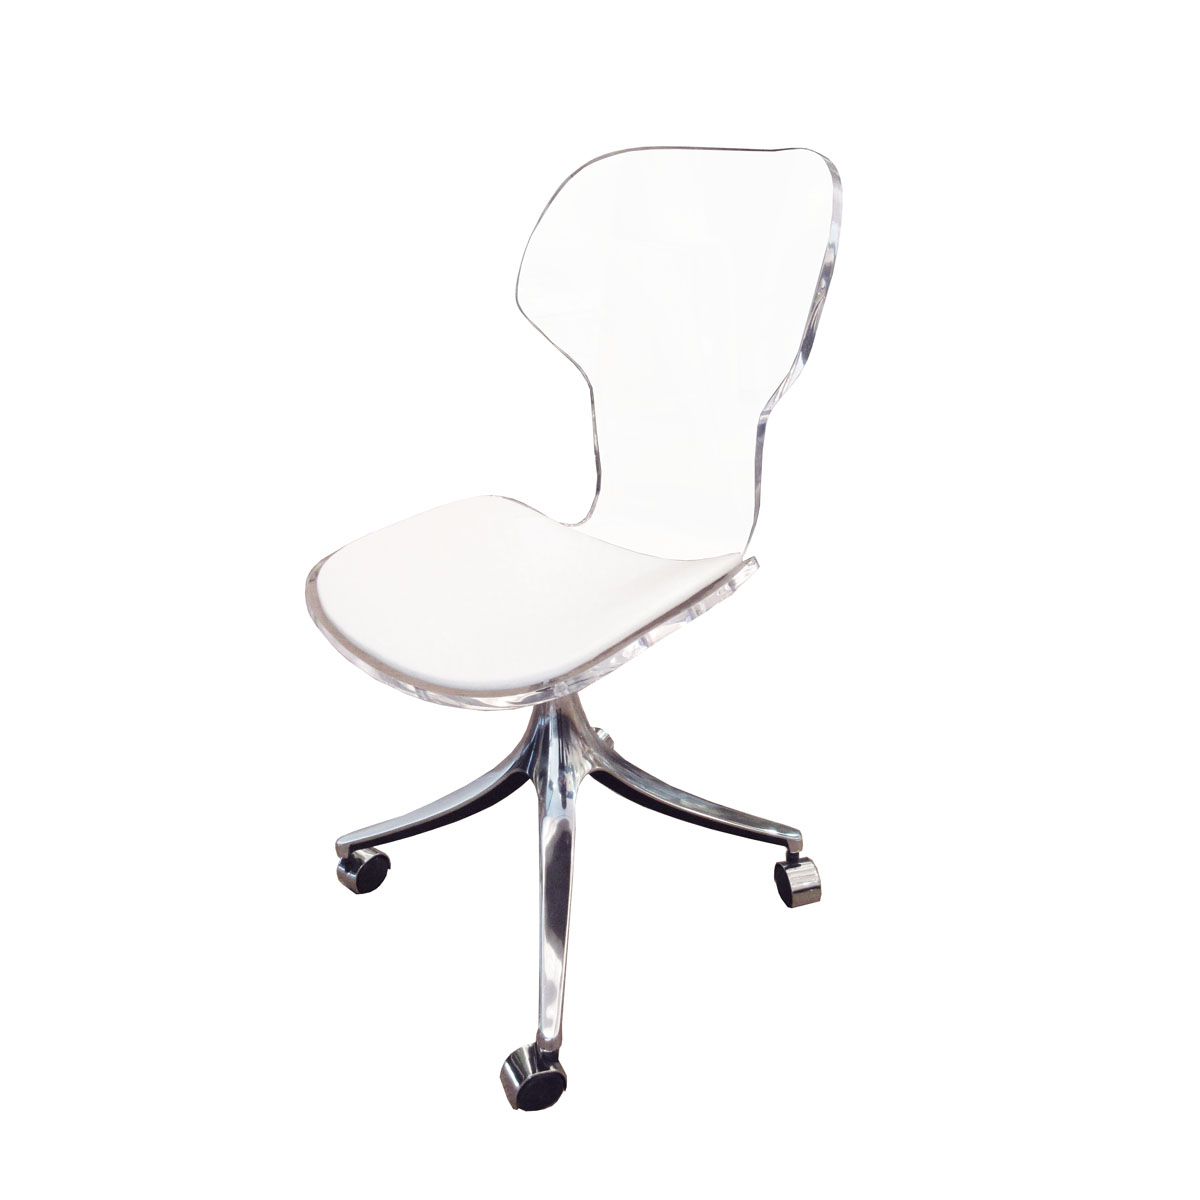 Rolling Lucite Chair Desk Chairs John Salibello